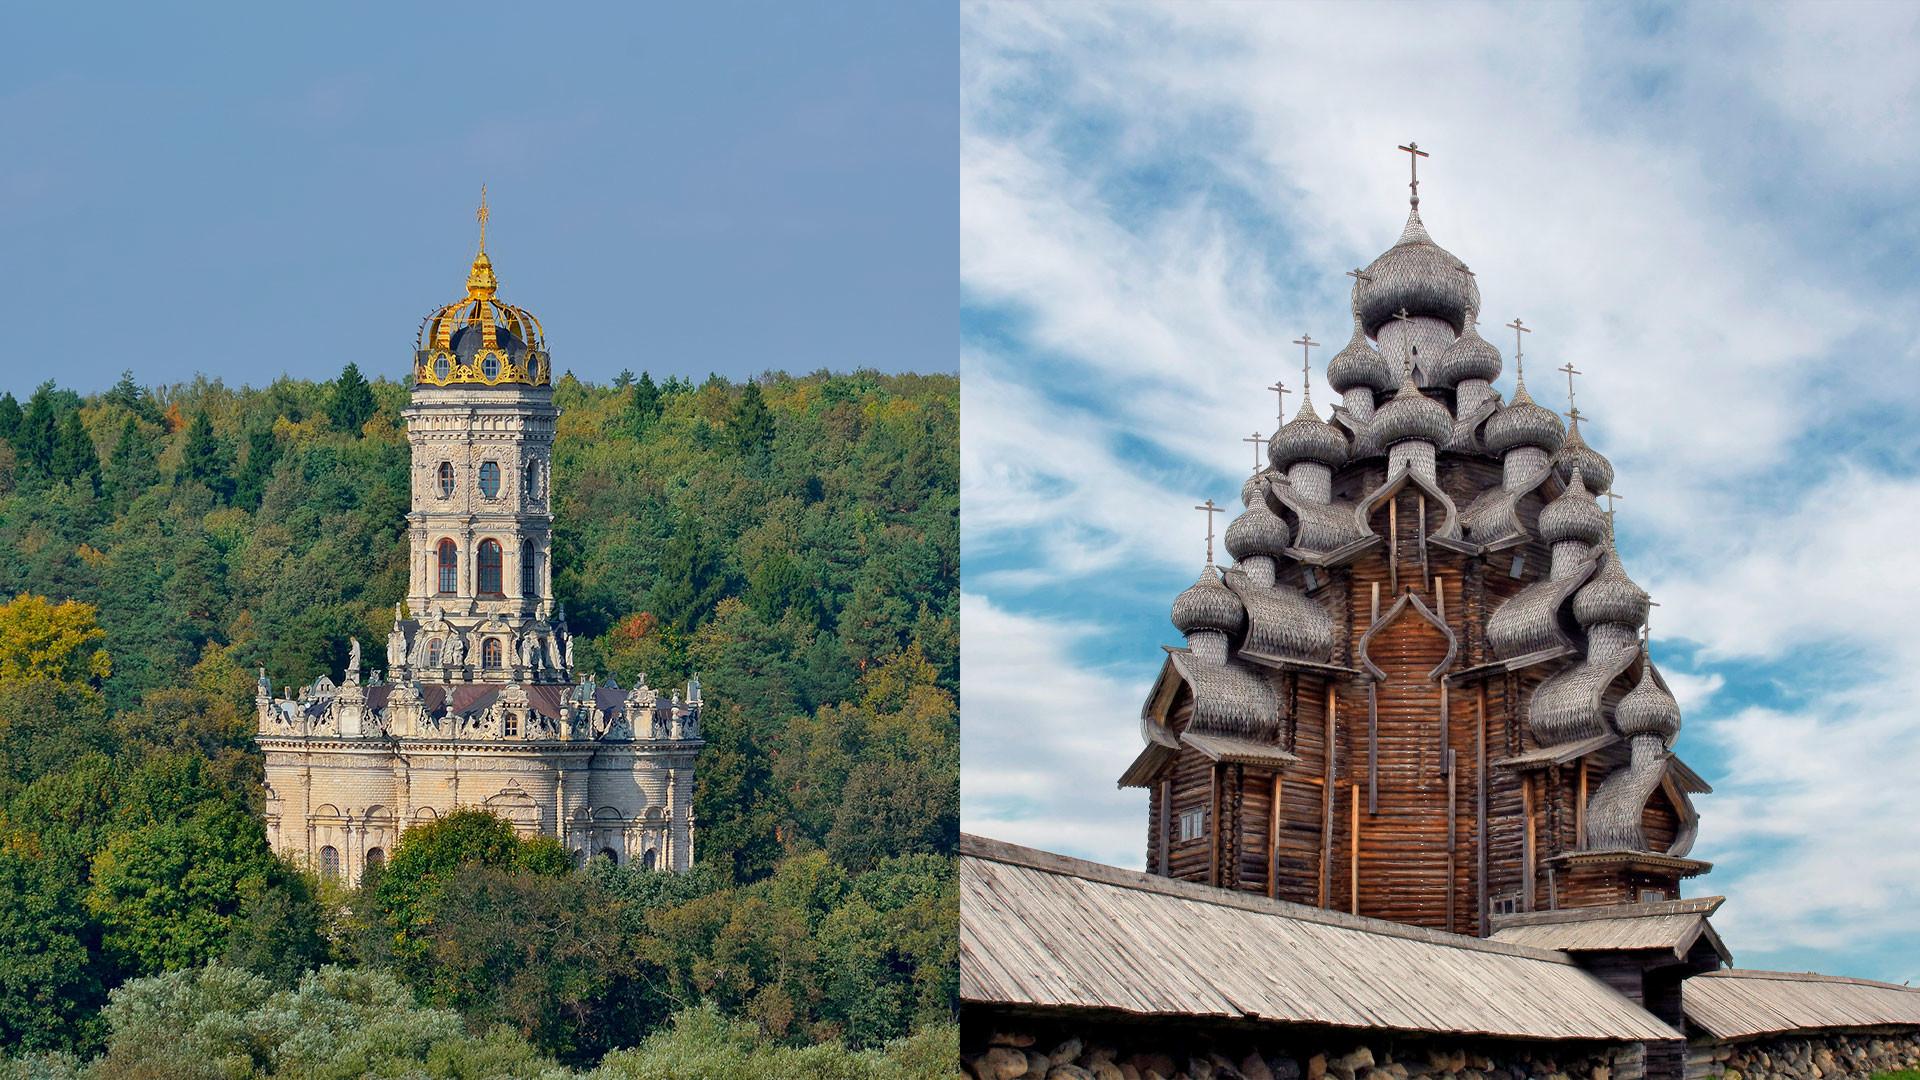 Znamenskaya Church in the Moscow Region (L); Church of the Transfiguration on the Kizhi island